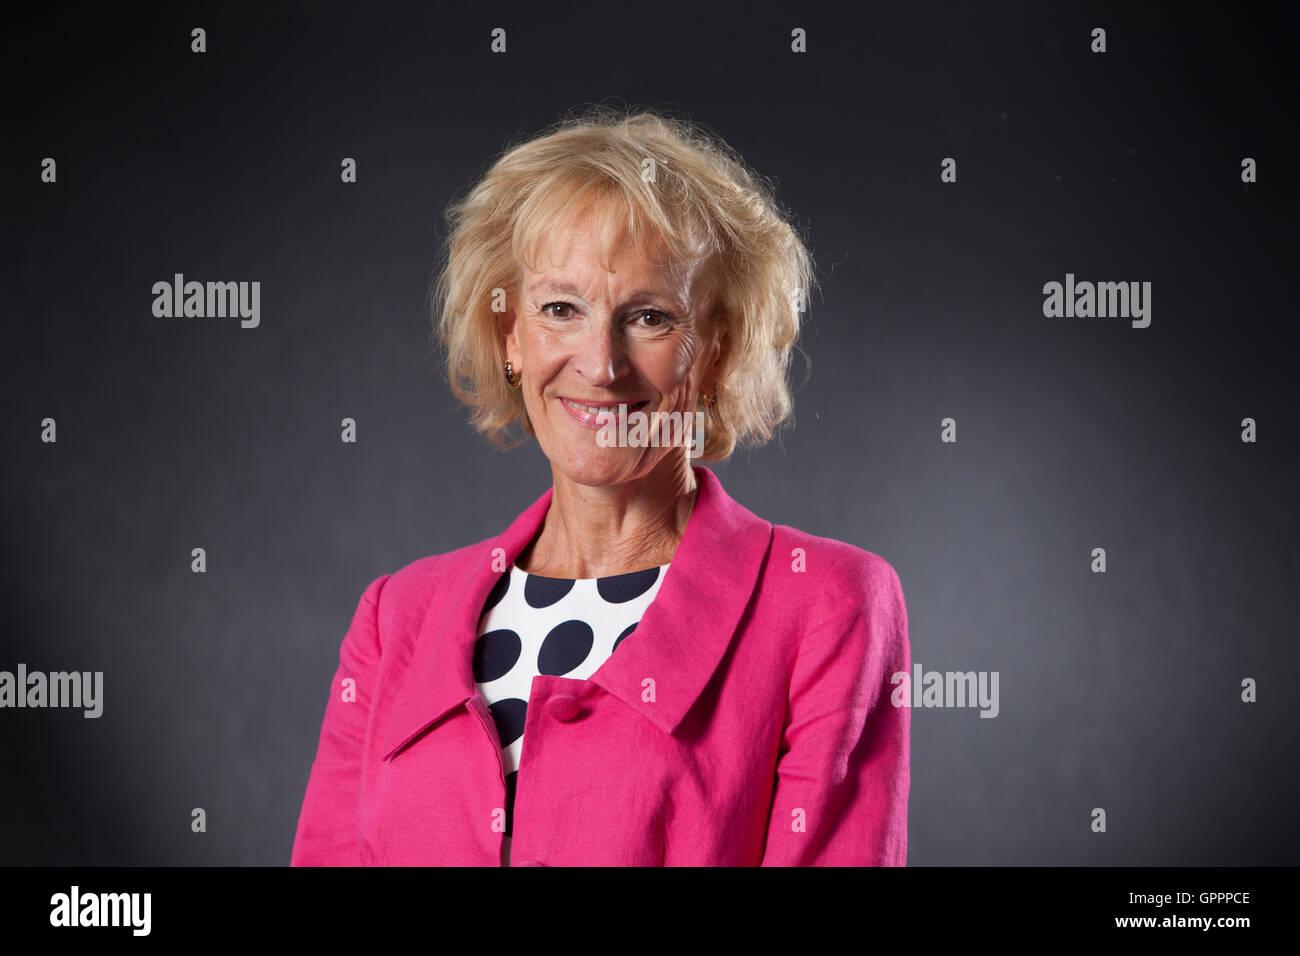 Sue Lawrence, the Scottish cookery and food writer, at the Edinburgh International Book Festival. Edinburgh, Scotland. - Stock Image